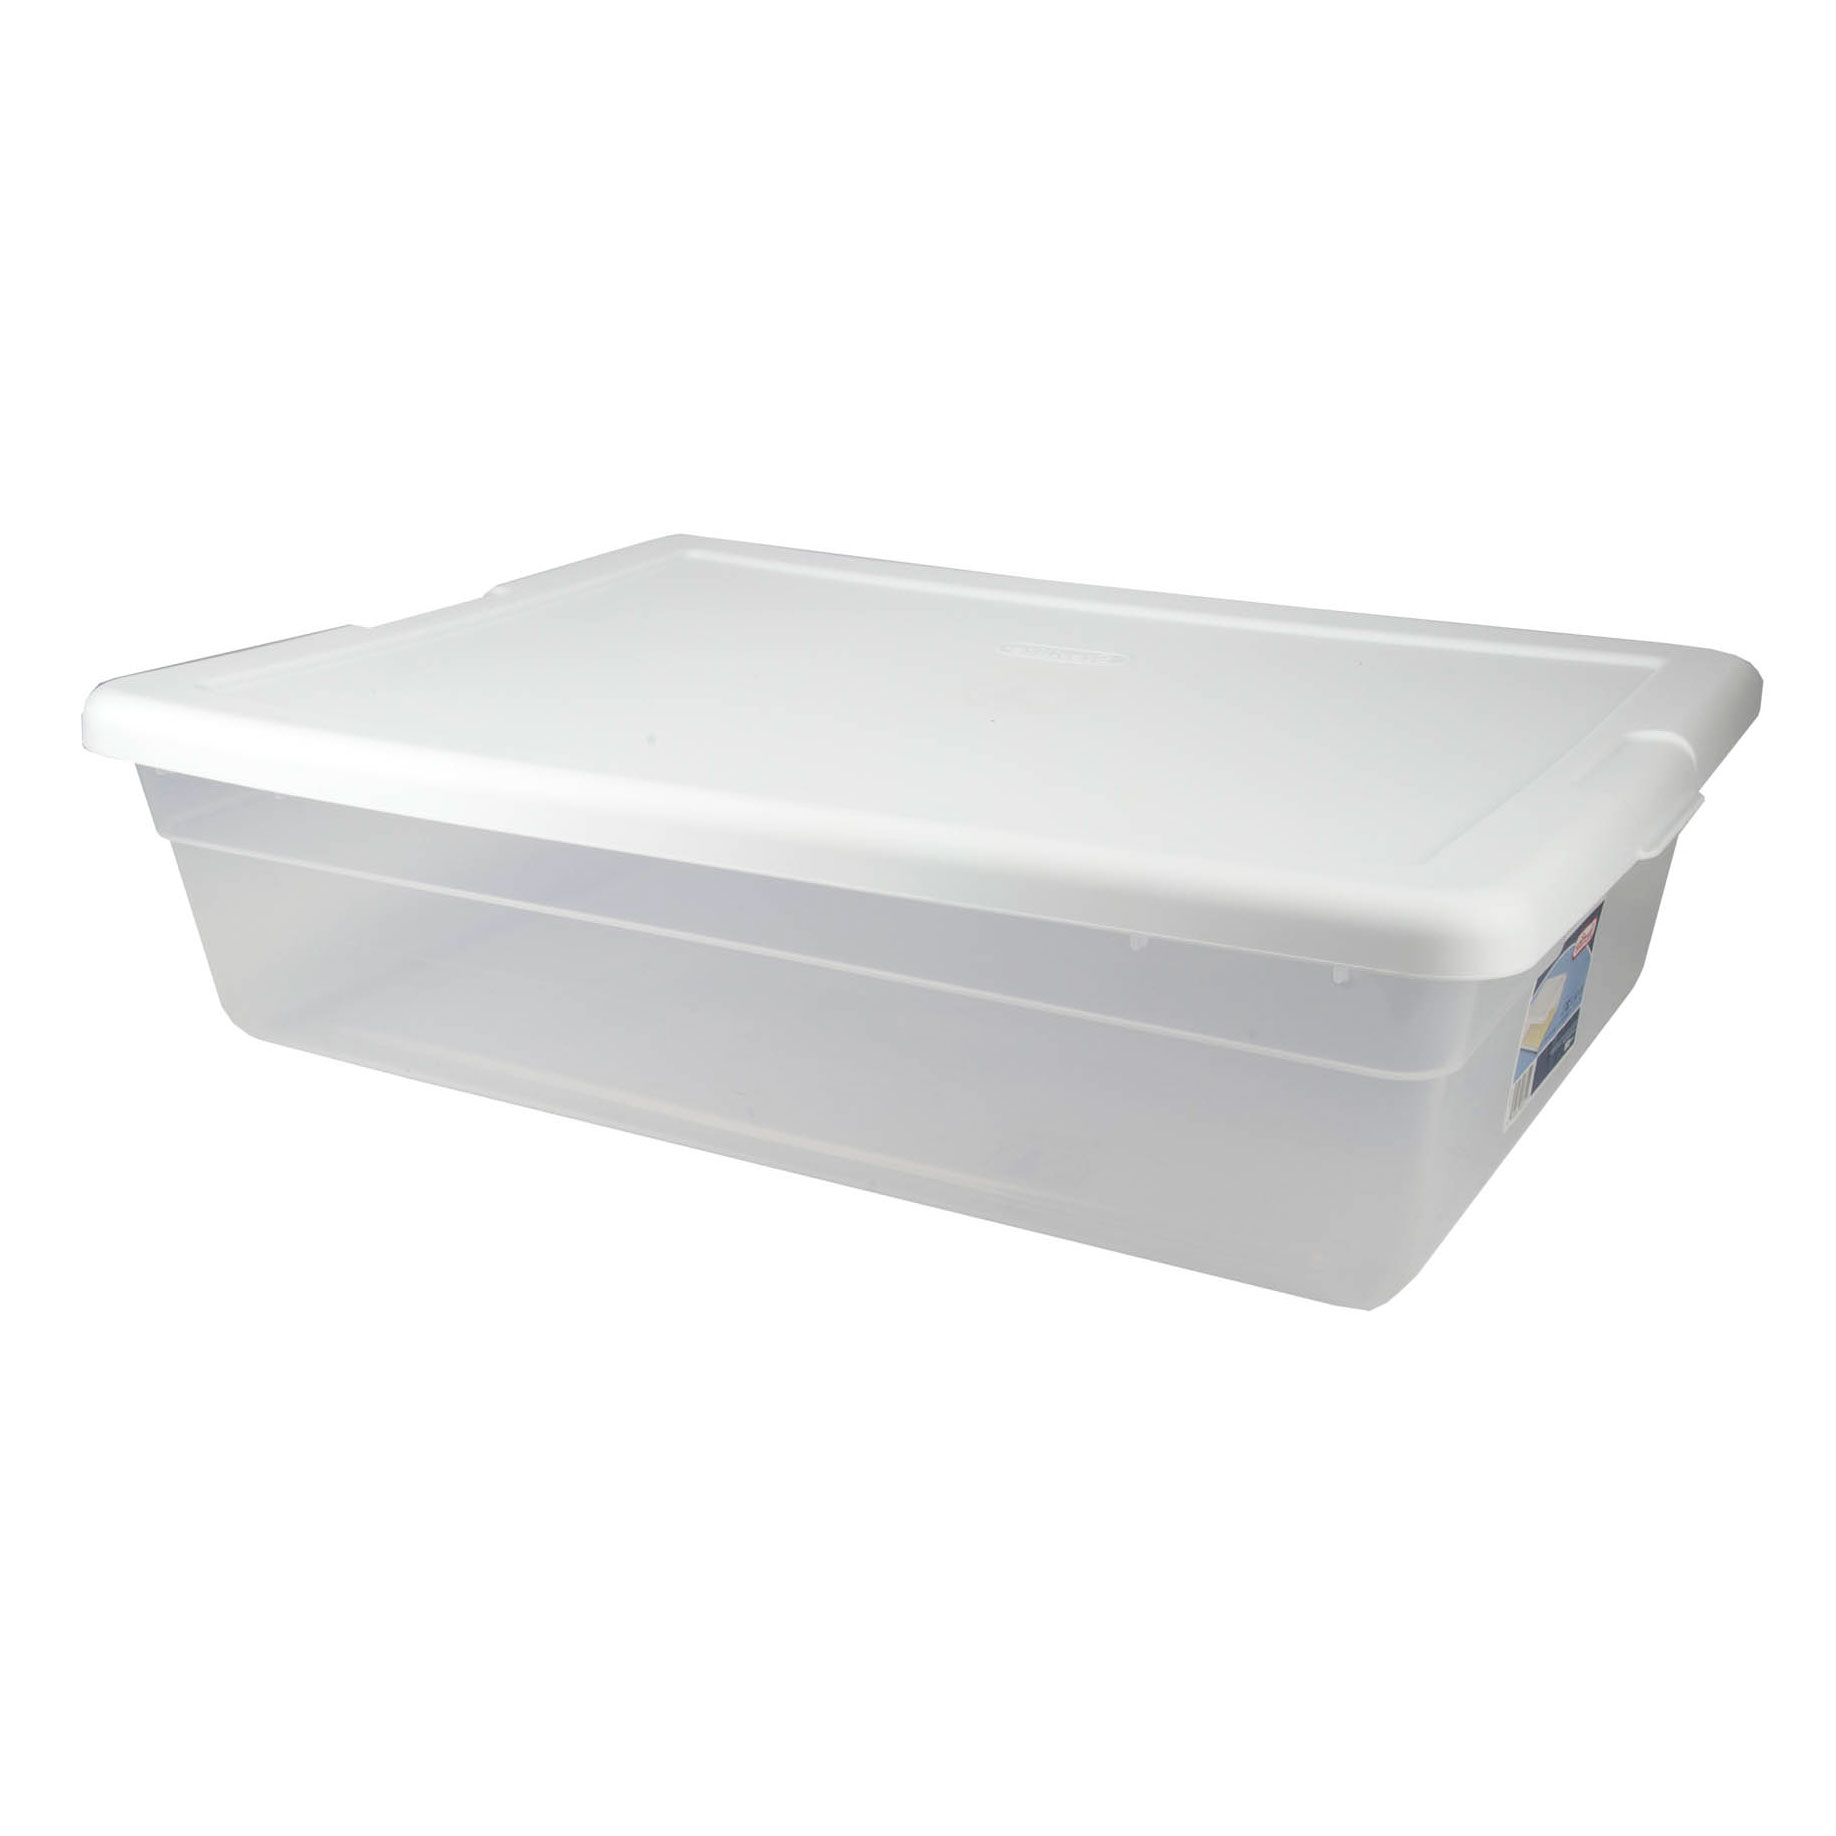 Sterilite 28 Qt Clear Closet/Under Bed Organizer Storage